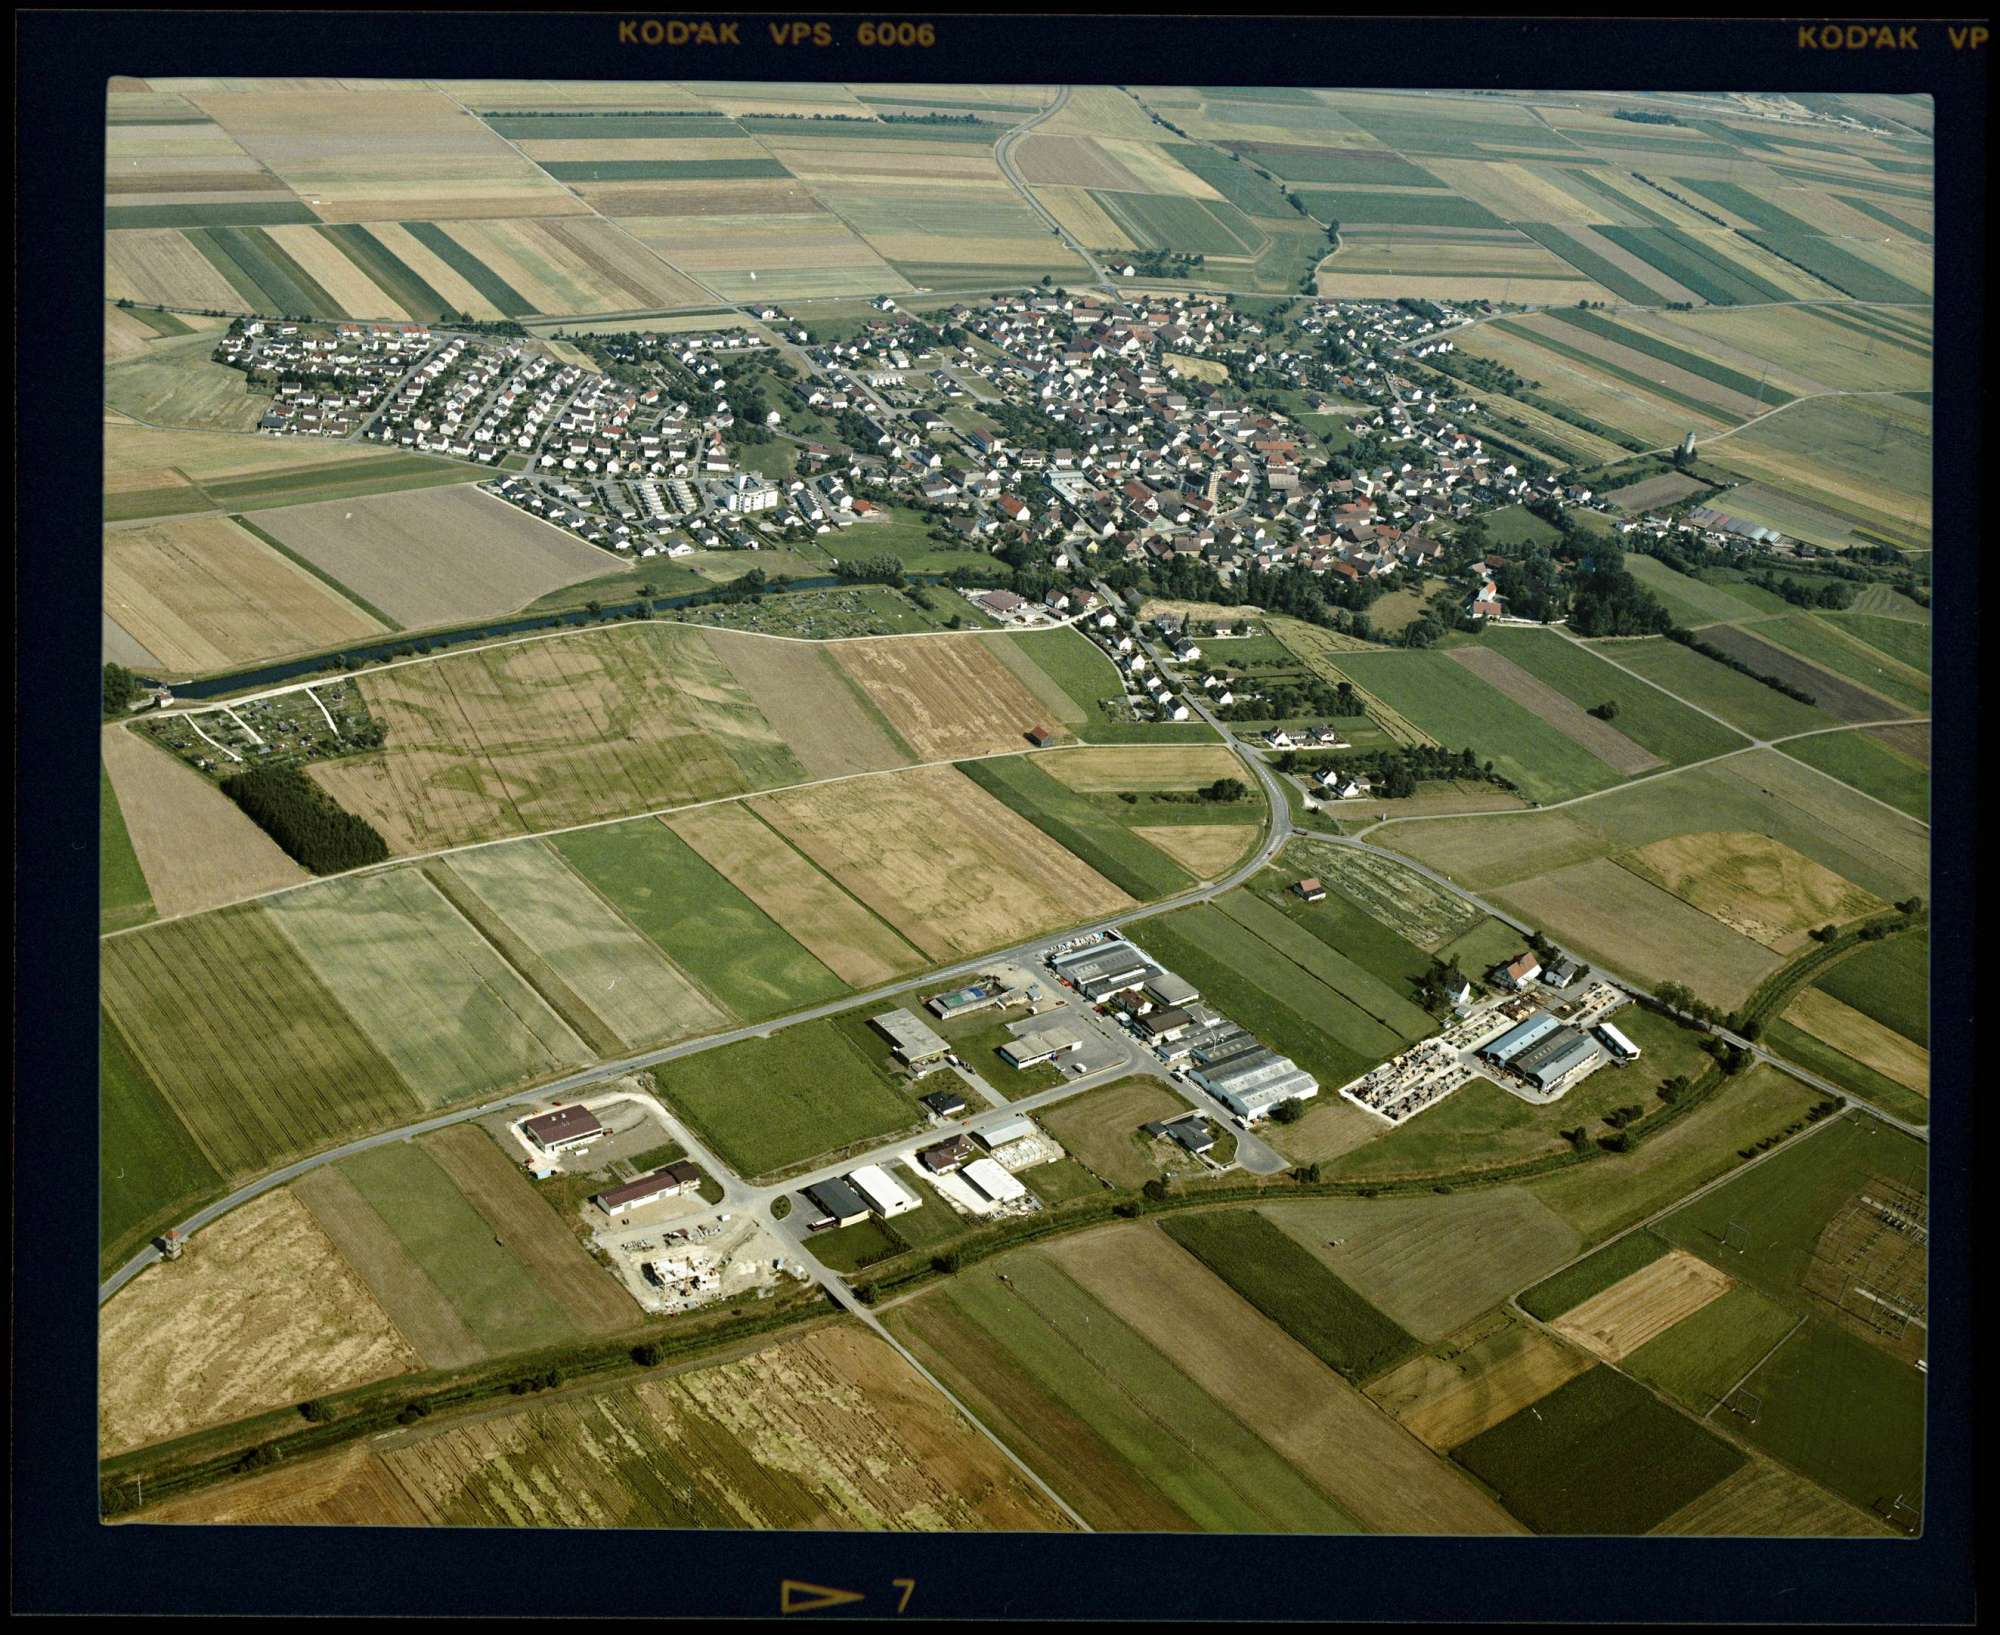 Dellmensingen, Luftbild, Bild 1